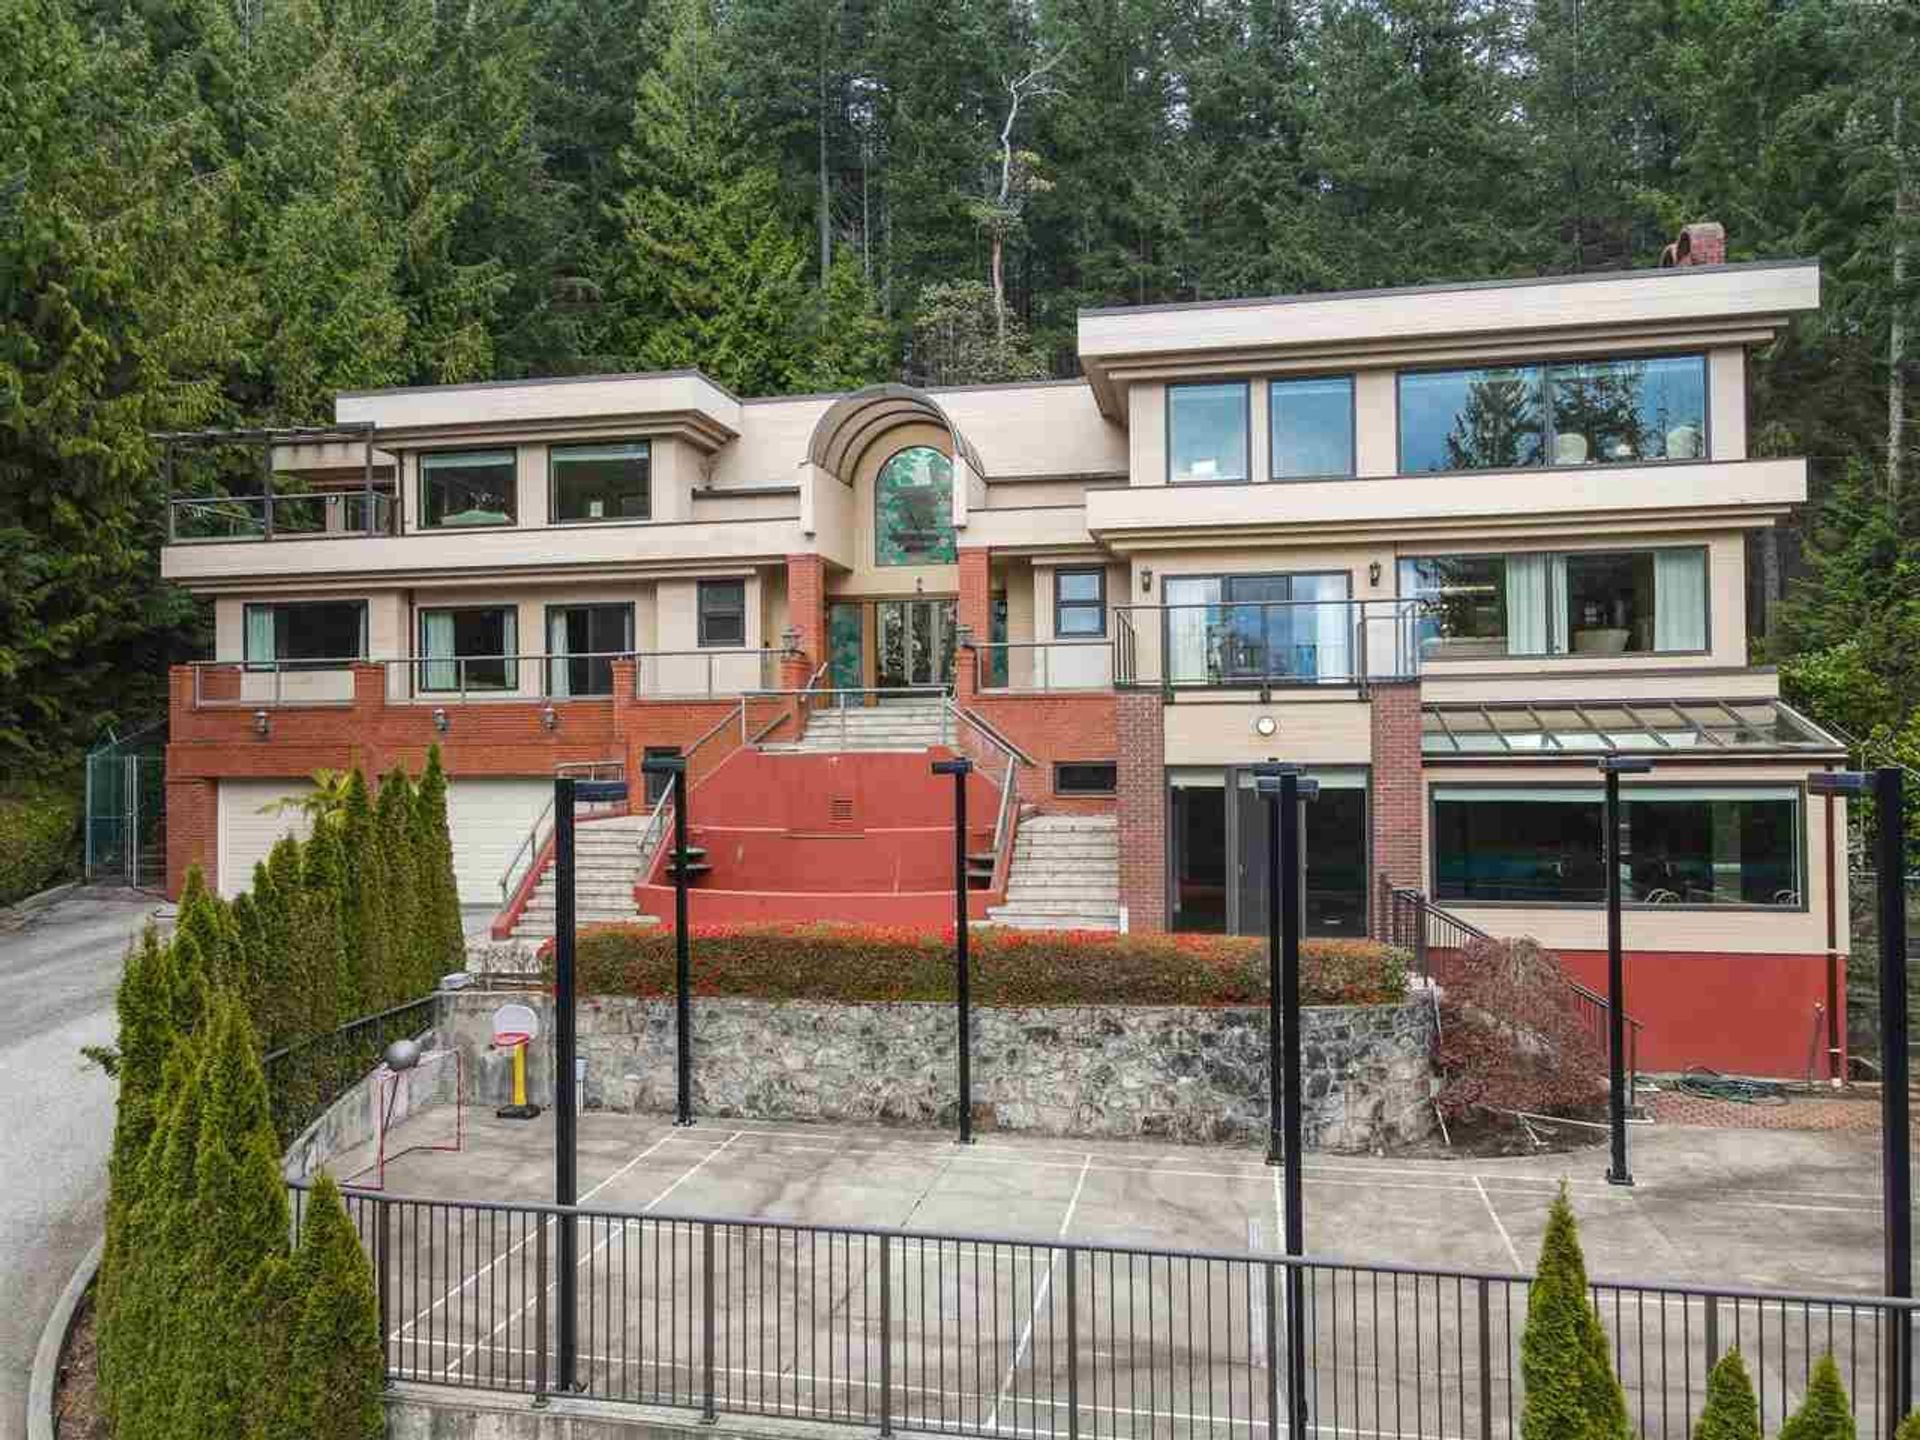 4556-woodgreen-drive-cypress-park-estates-west-vancouver-31 at 4556 Woodgreen Drive, Cypress Park Estates, West Vancouver